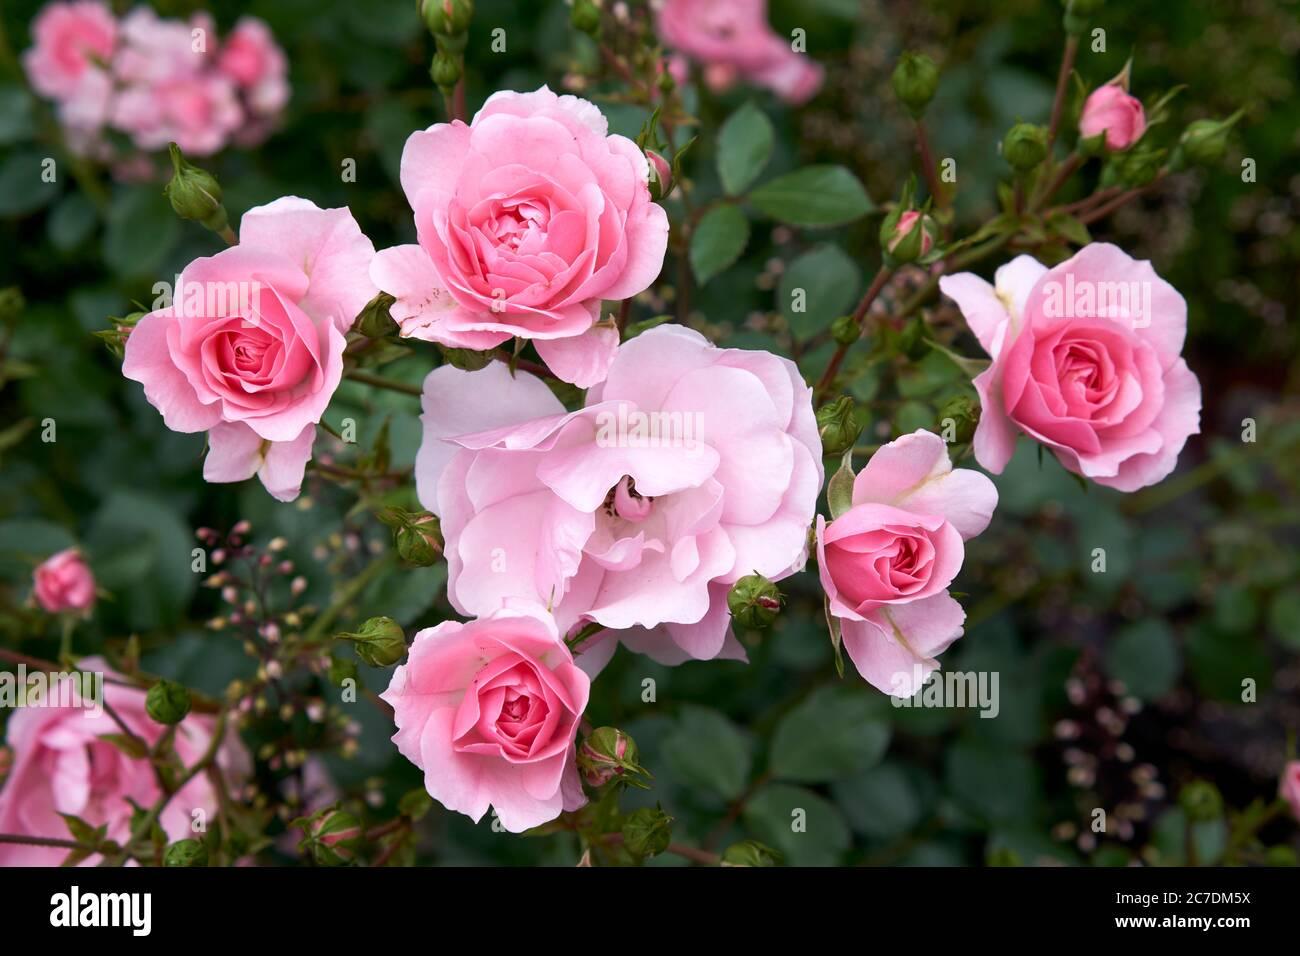 pink-roses-2C7DM5X.jpg